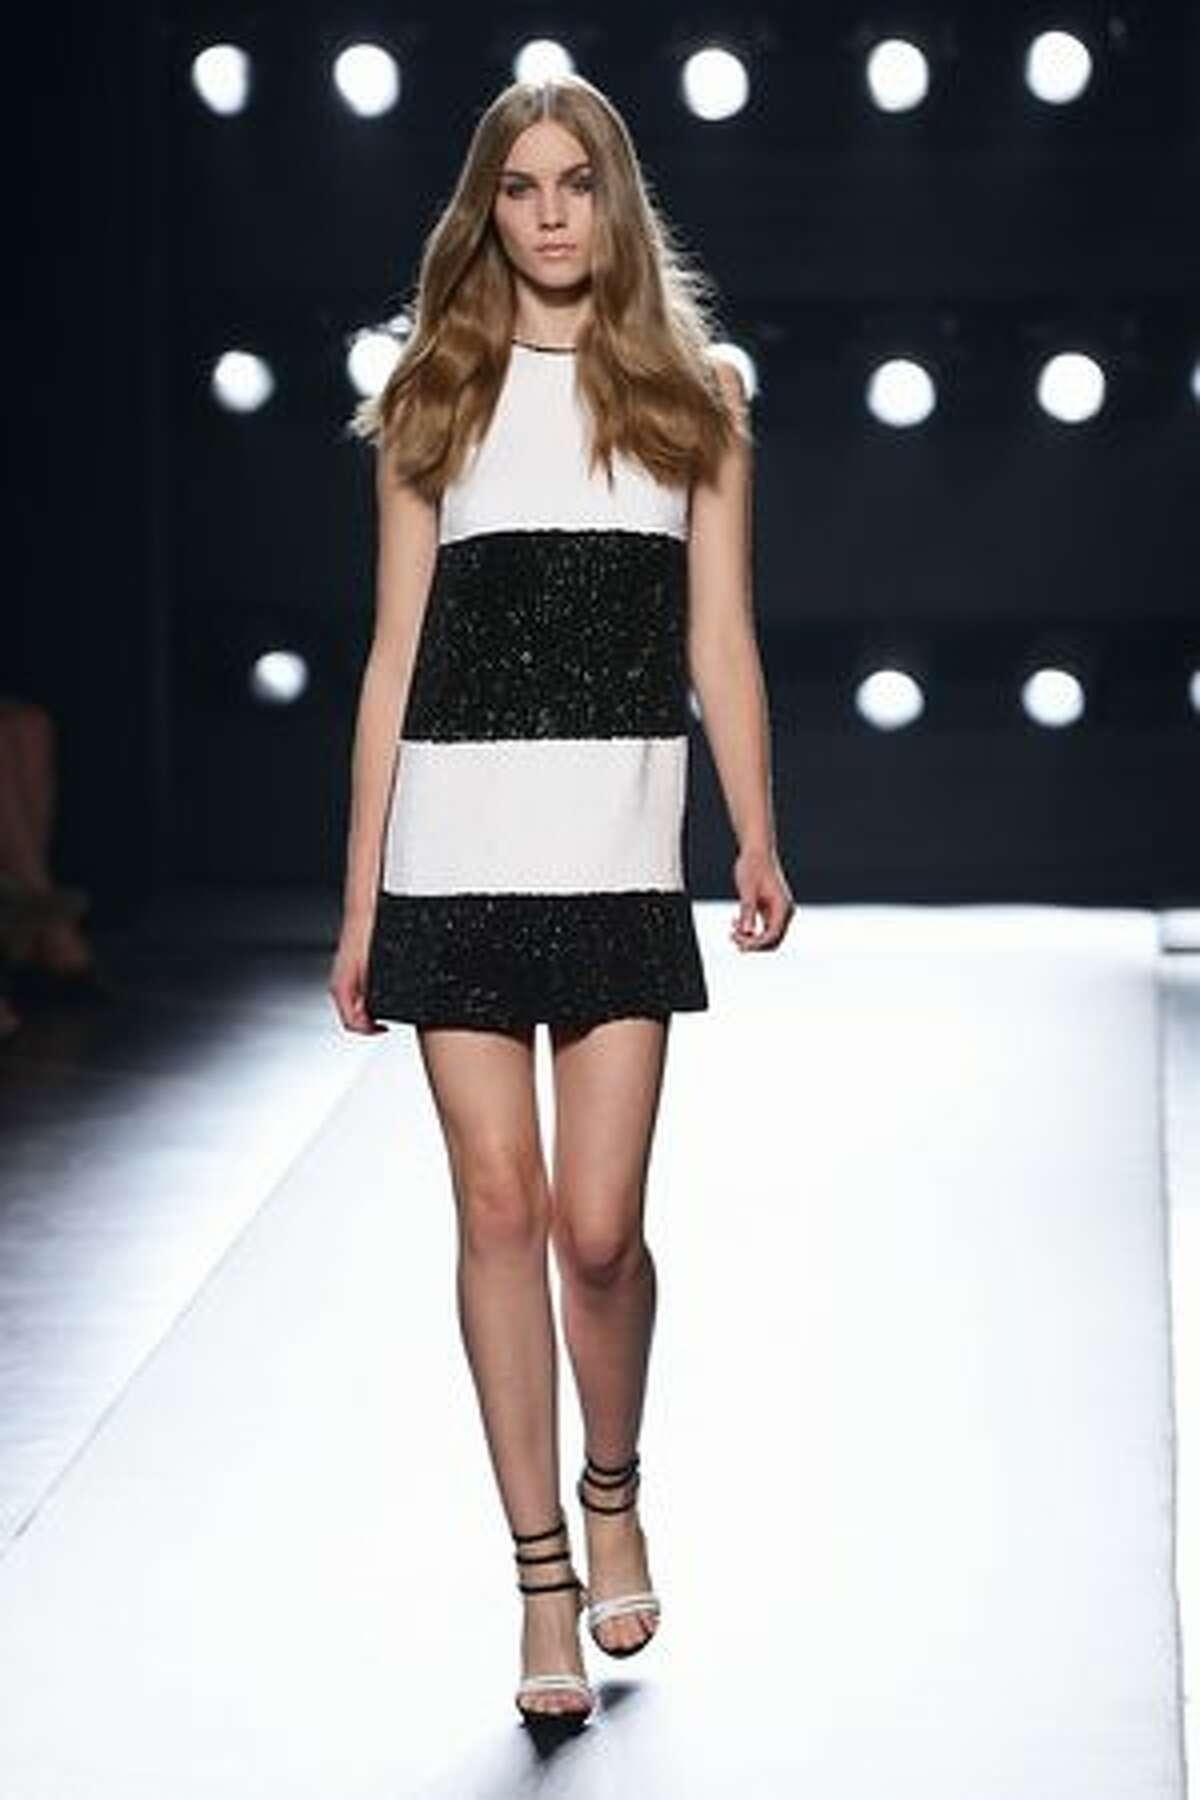 A model walks down the runway during Ferre Spring/Summer 2011 fashion show during Milan Fashion Week Womenswear in Milan, Italy.